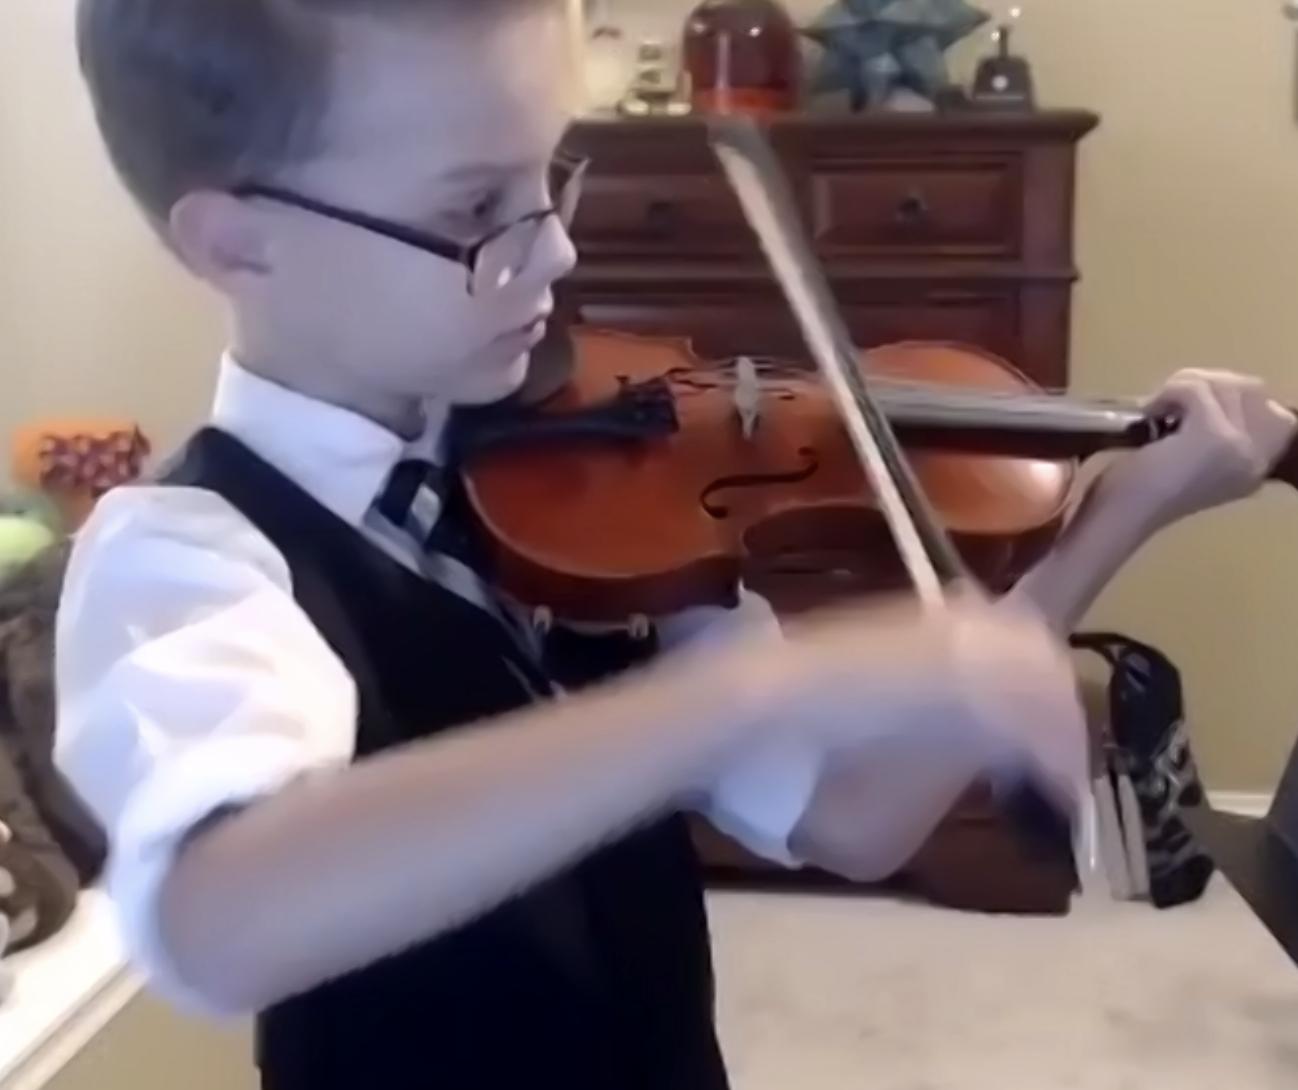 Liam violin lesson student Houston TX